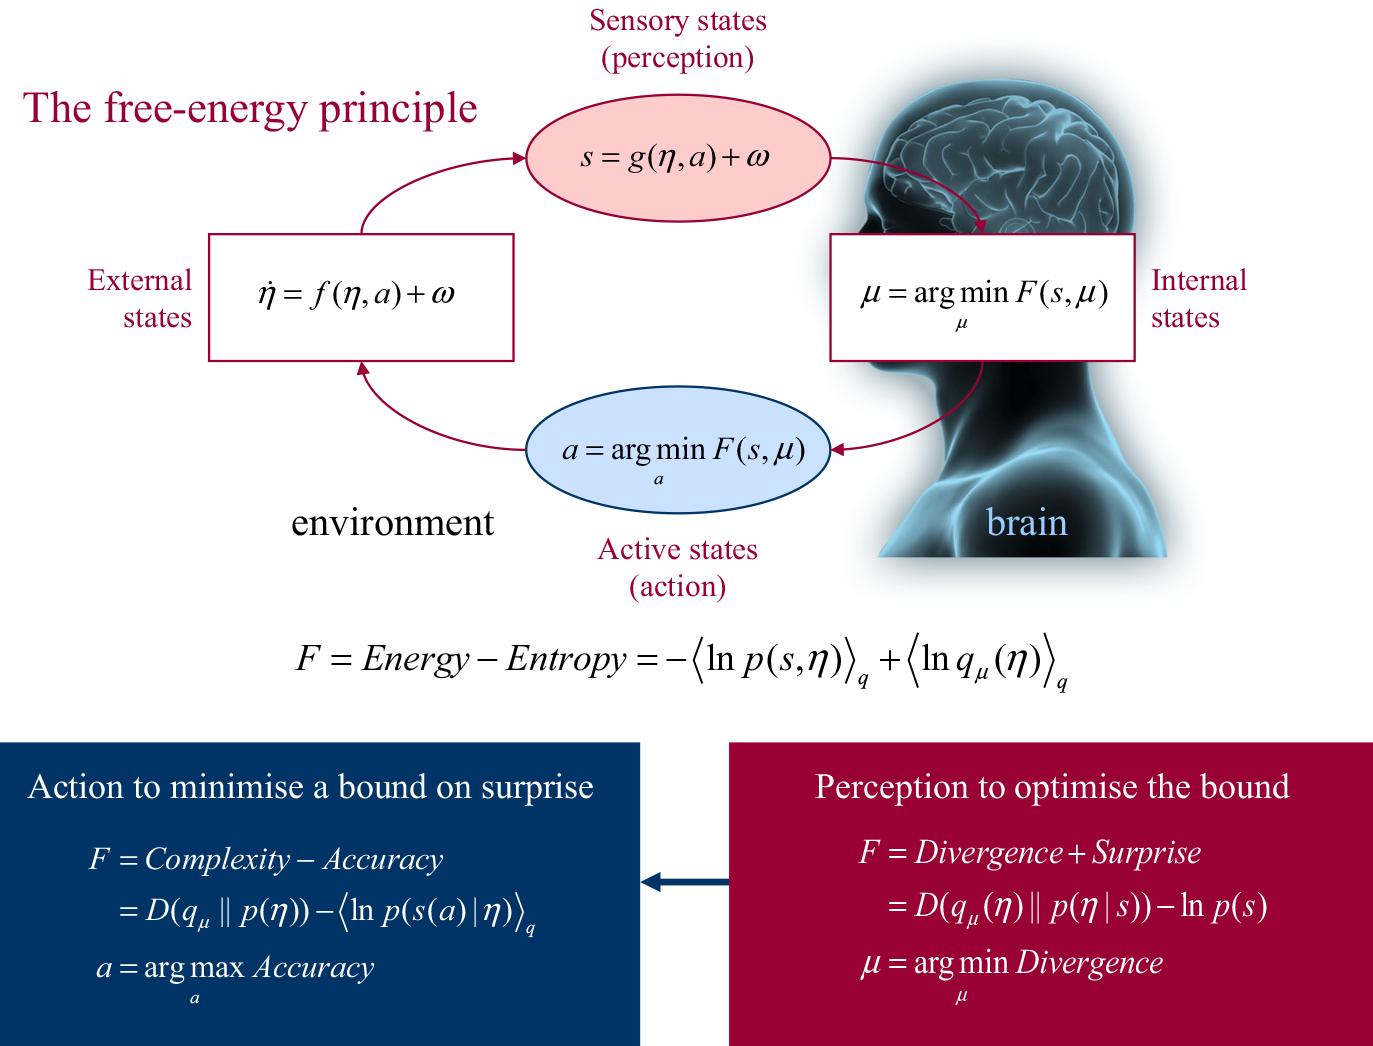 The free energy principle flowchat